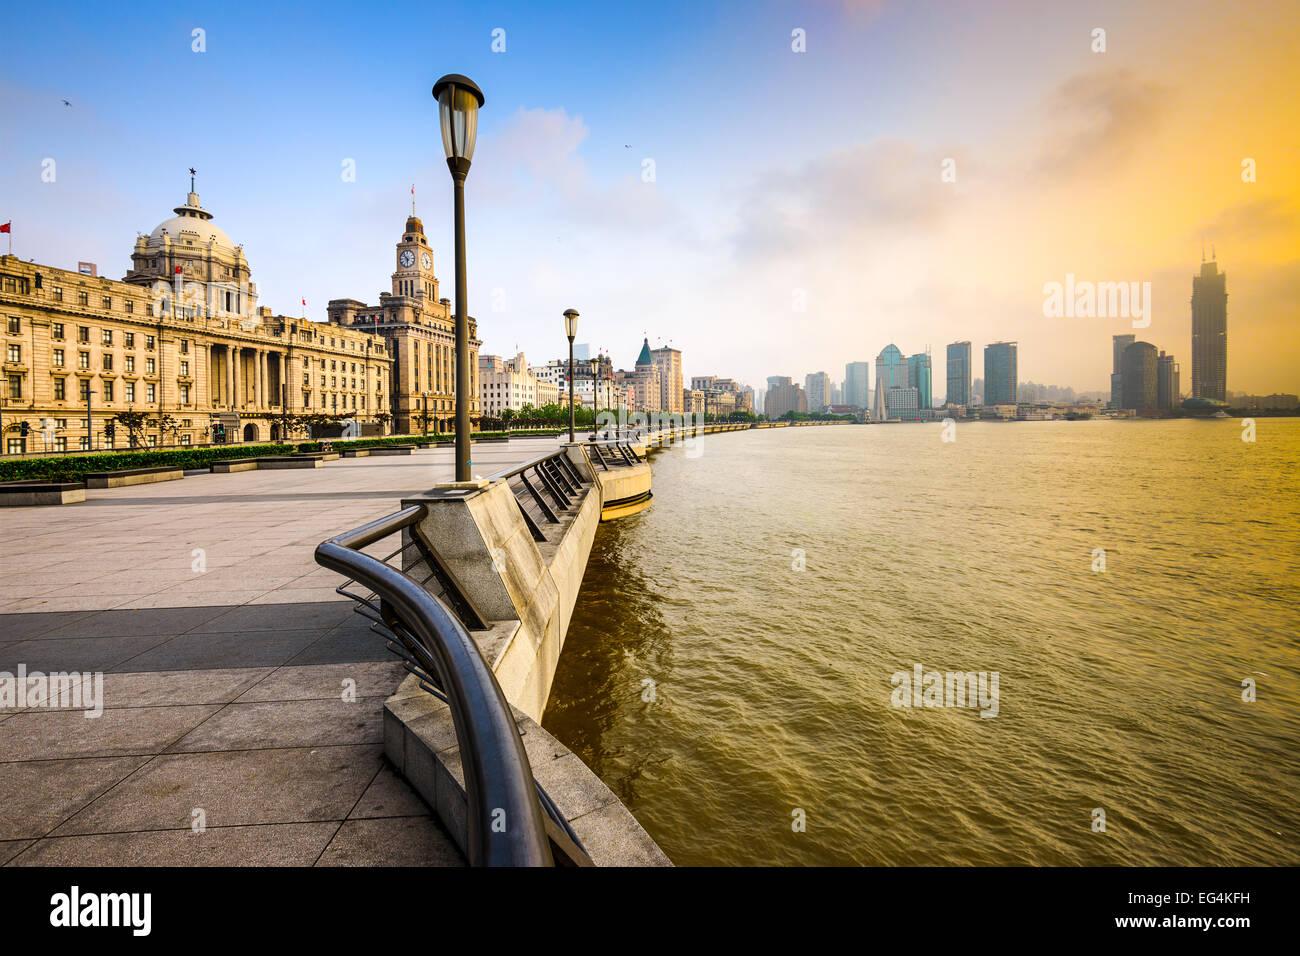 Shanghai, China cityscape at the Bund. - Stock Image